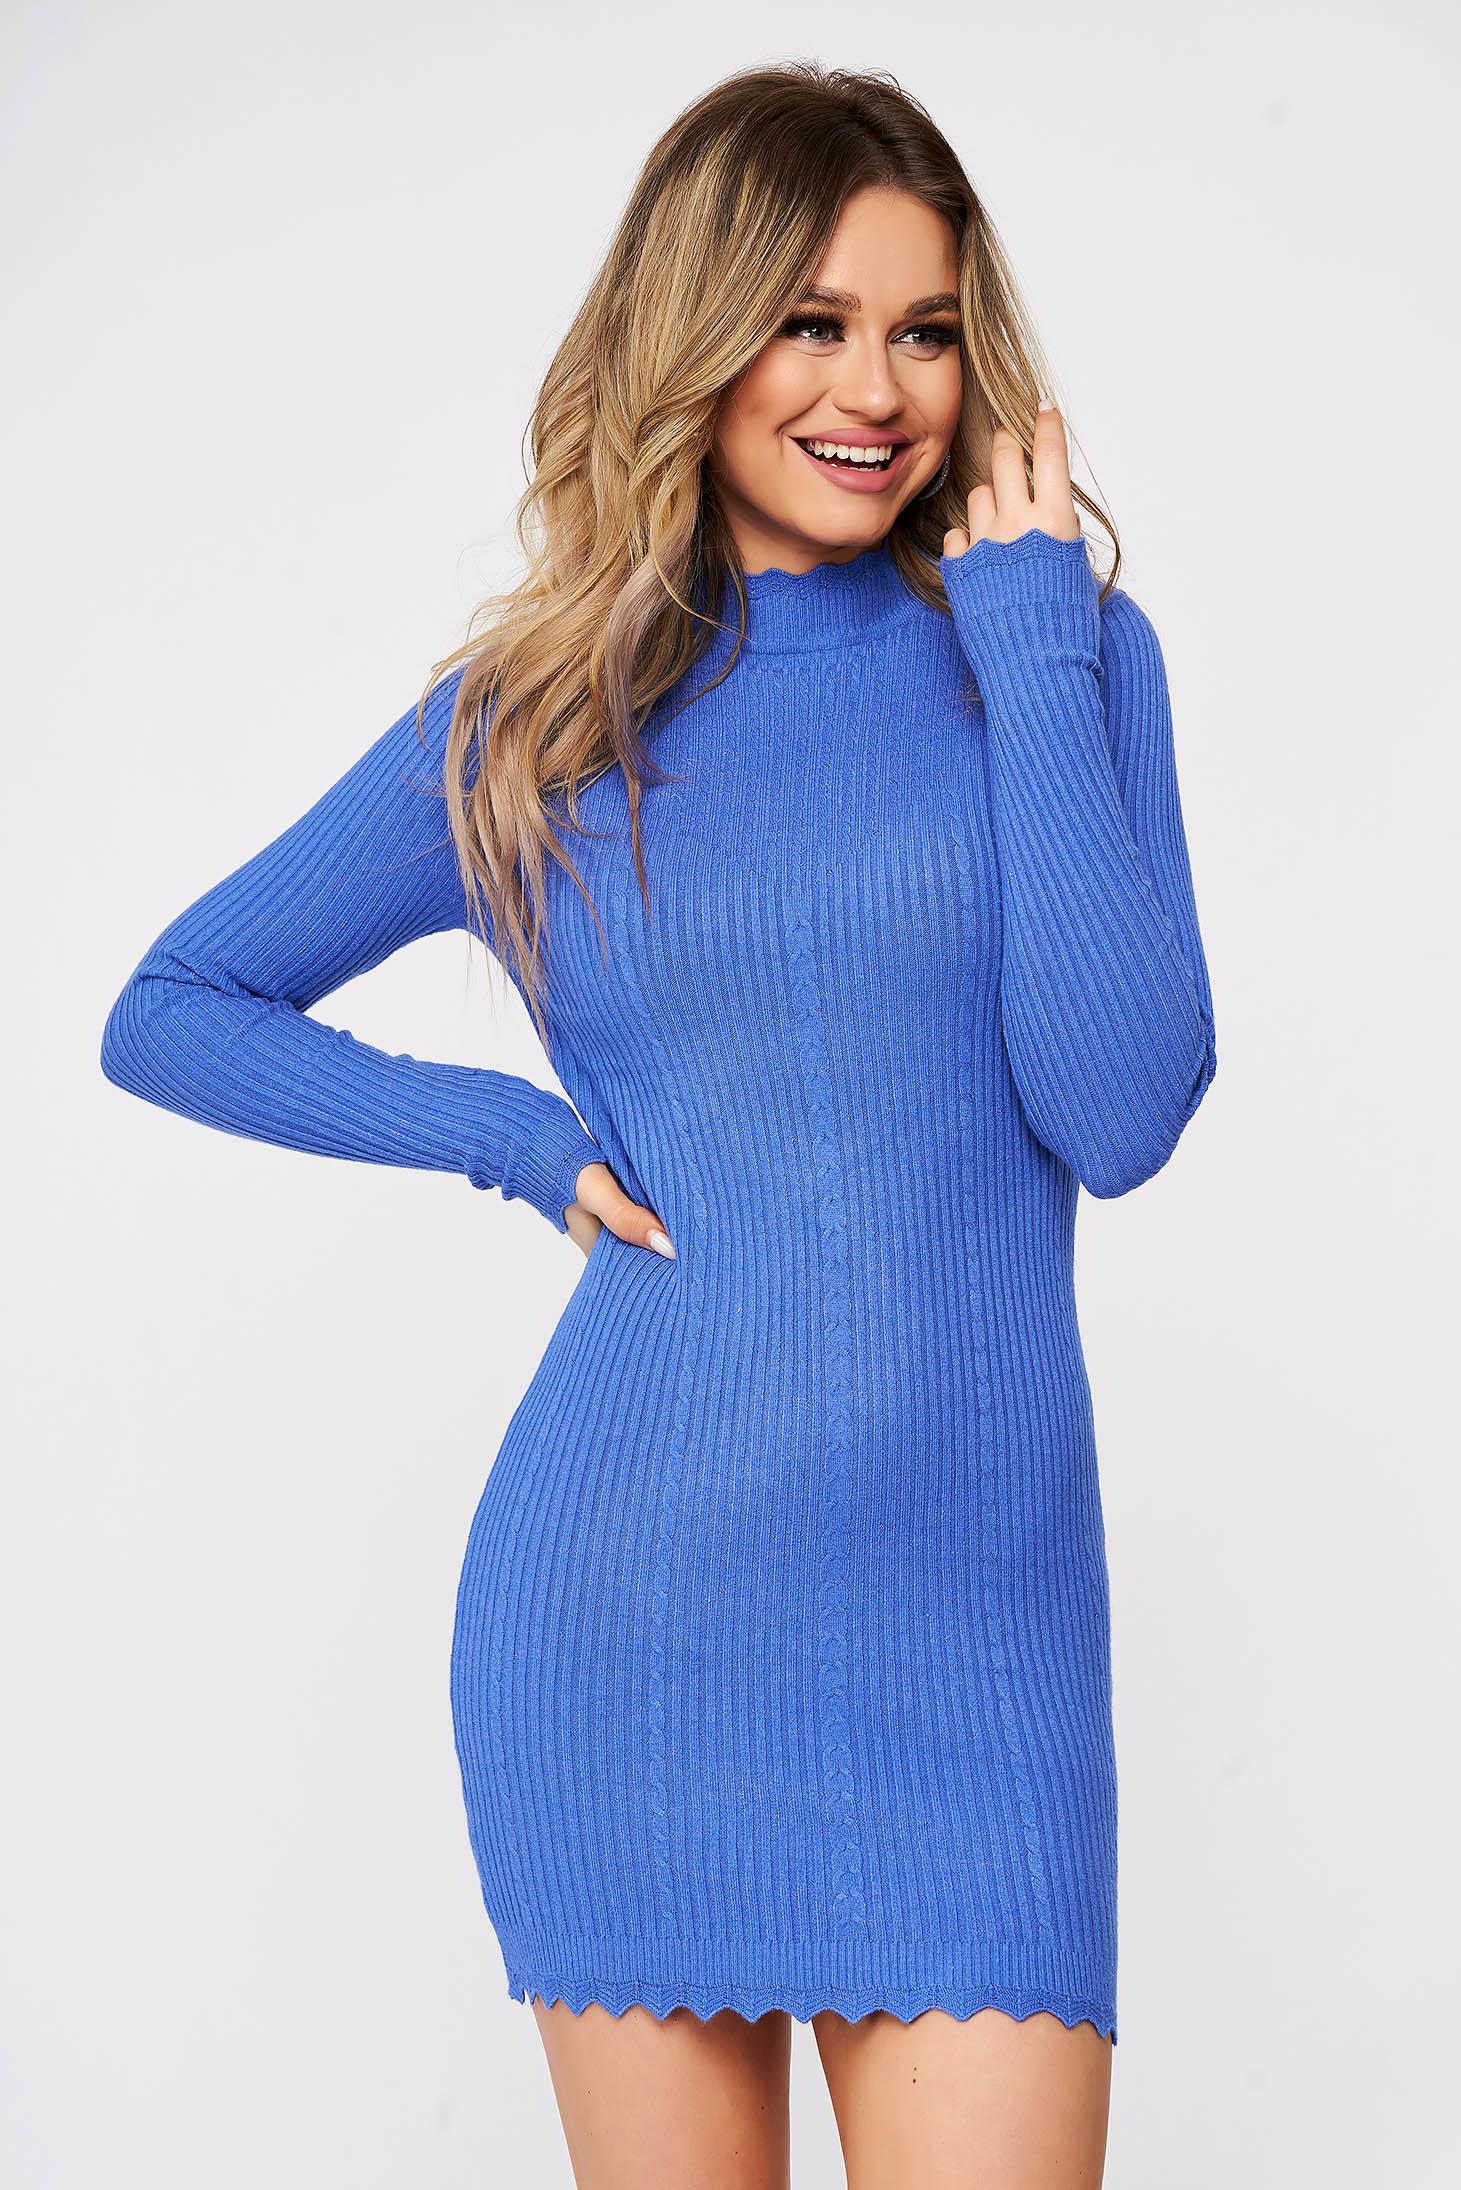 Rochie SunShine albastra tricotata cusaturi fine si in relief din material elastic reiat